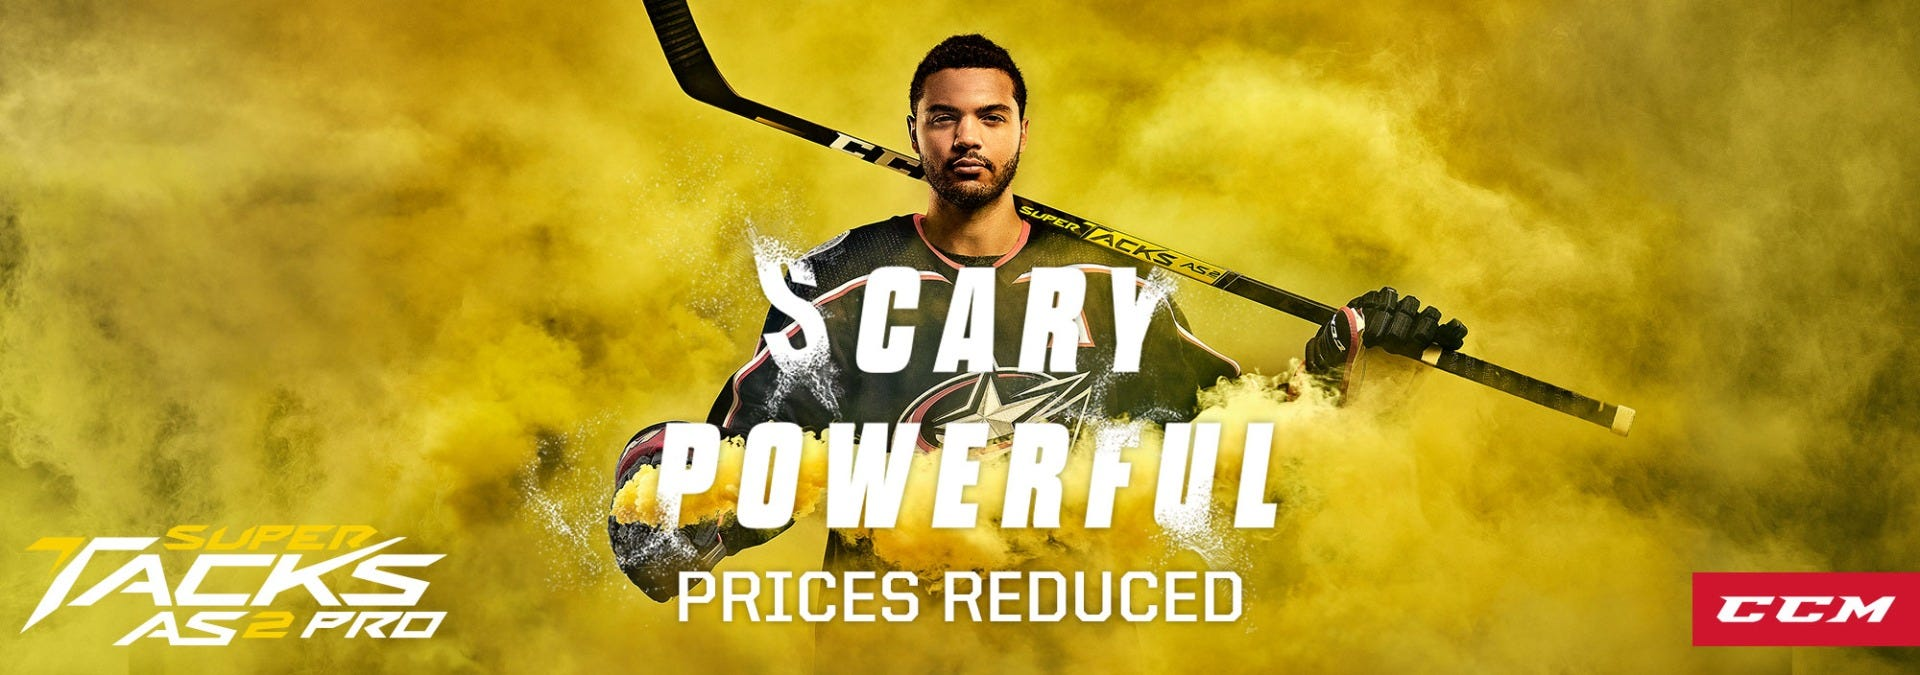 Prices Reduced on CCM Super Tacks Hockey Sticks